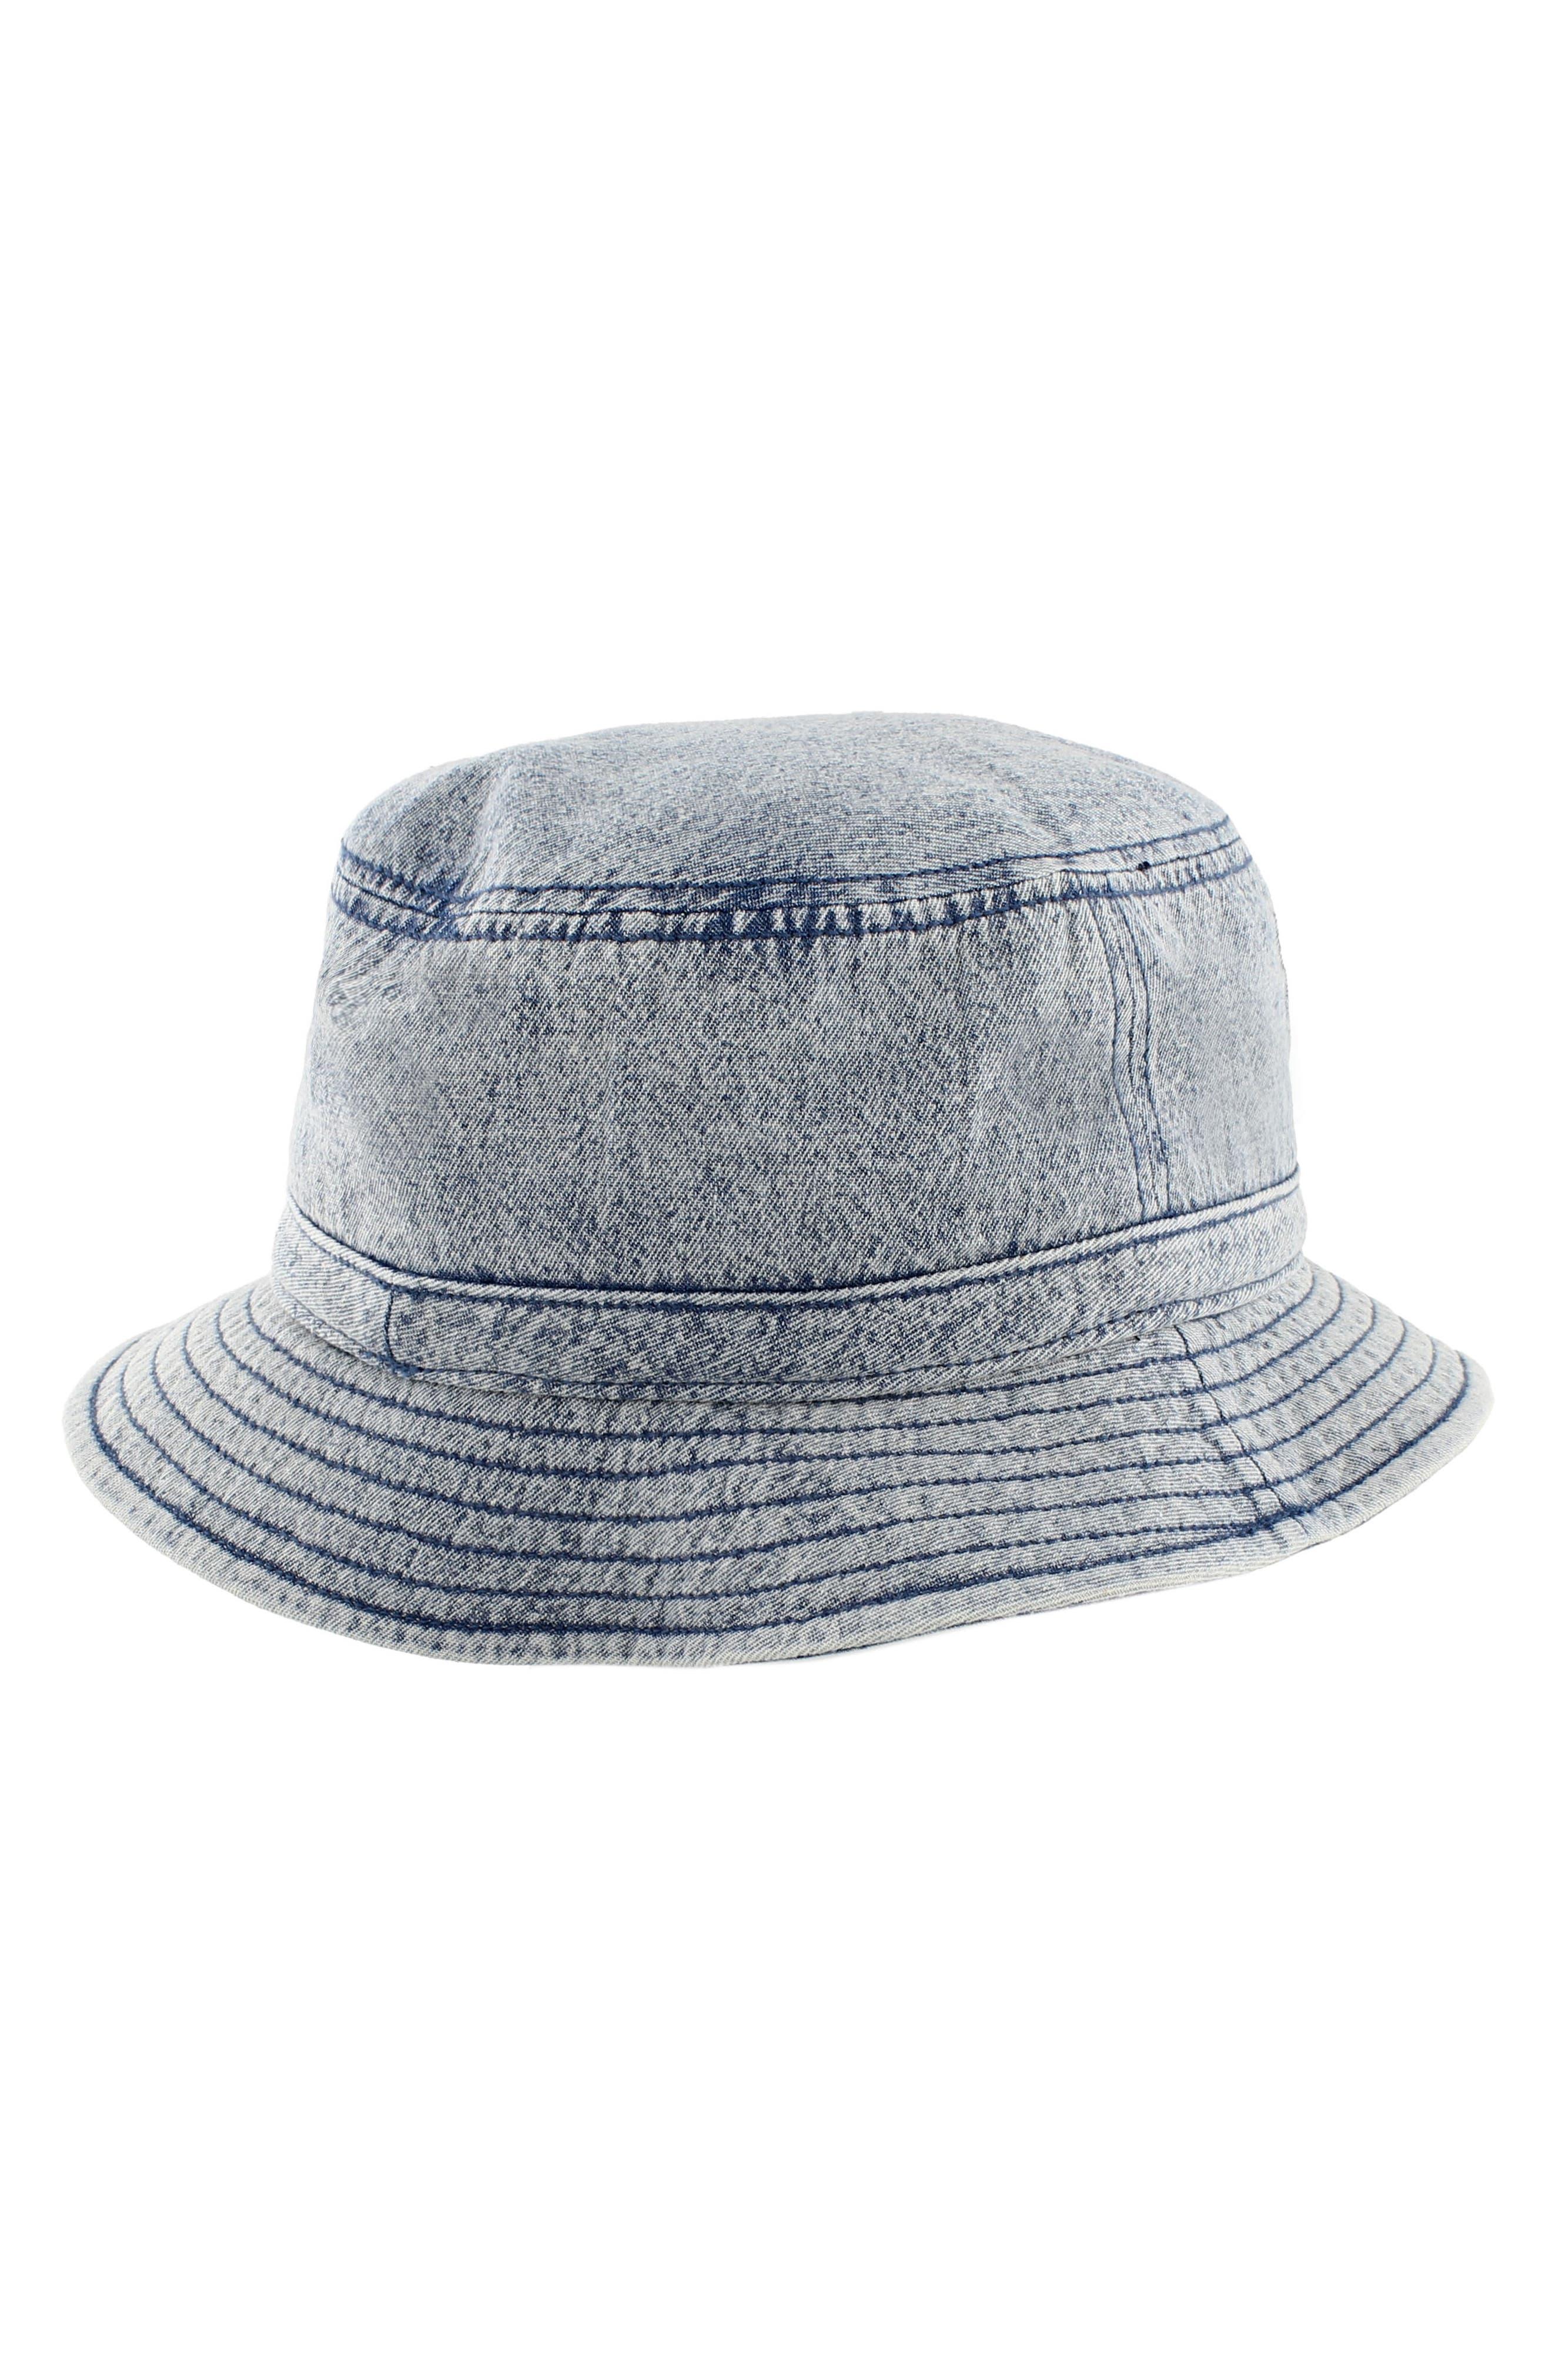 Denim Bucket Hat,                             Alternate thumbnail 2, color,                             420